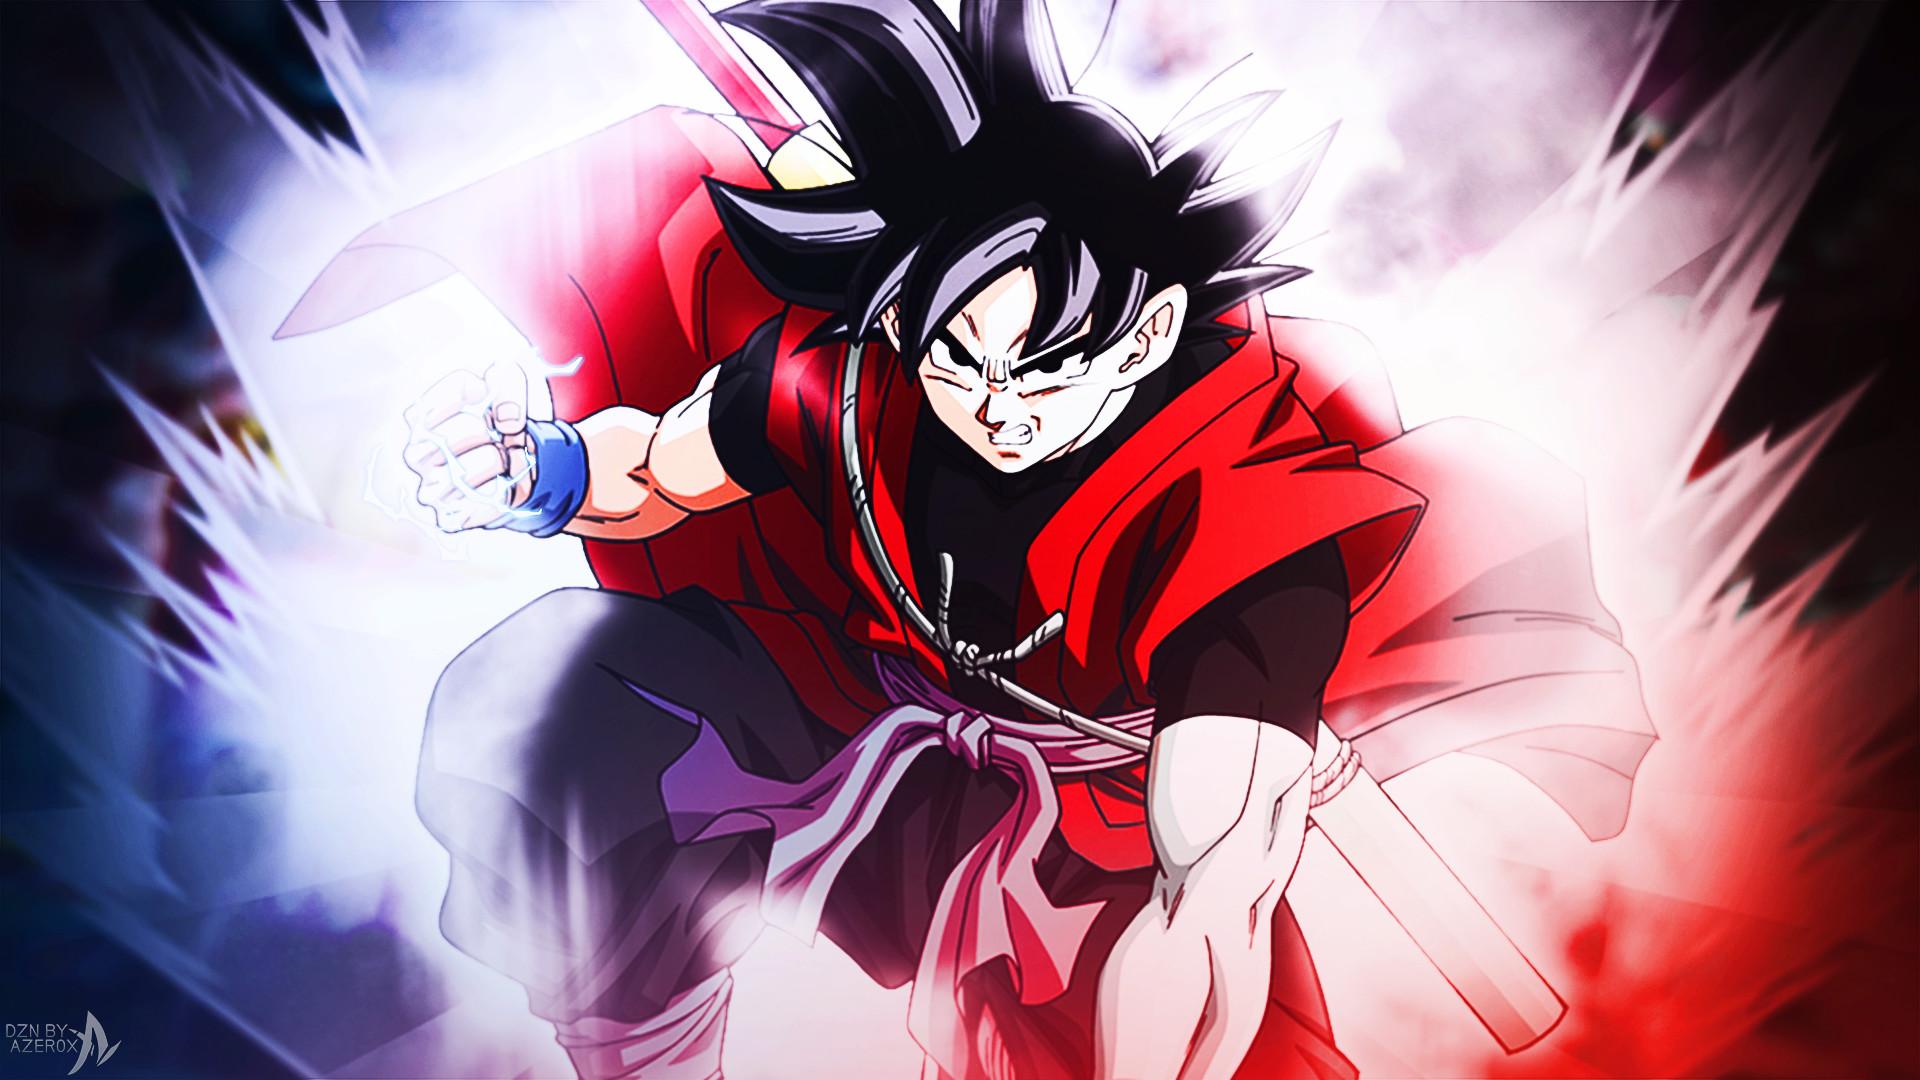 Goku Ssj5 Wallpapers 48 Images